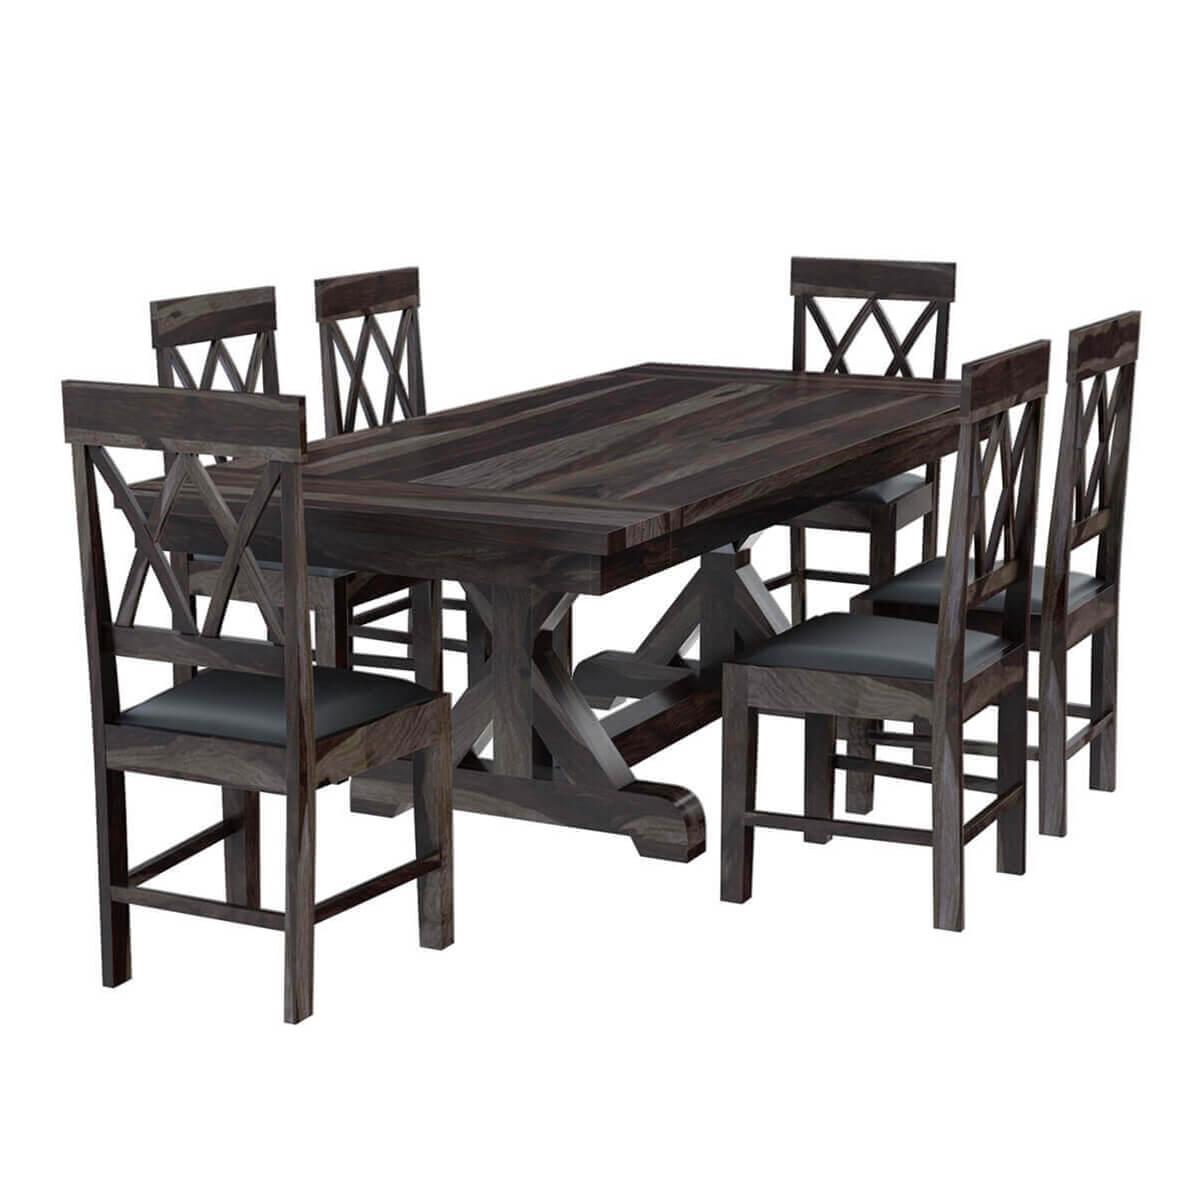 Farmhouse Kitchen Extending Table: Antwerp Farmhouse Solid Wood Extendable Dining Table & Chair Set